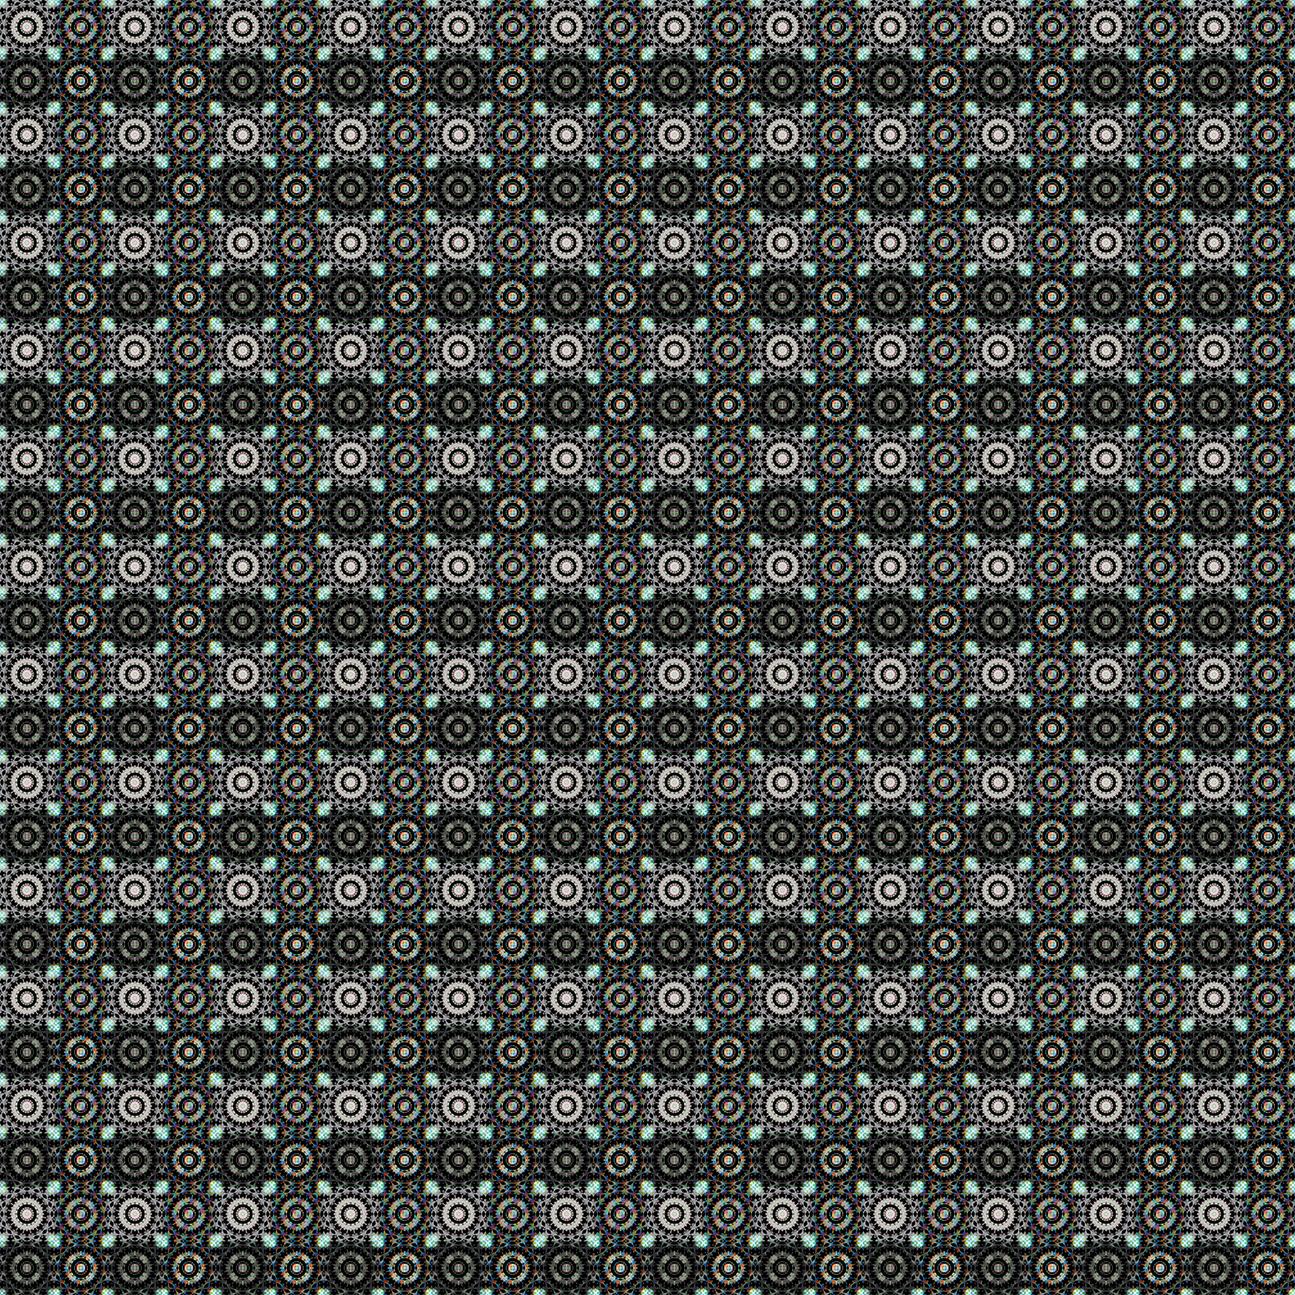 4up31080-1-1295.jpg